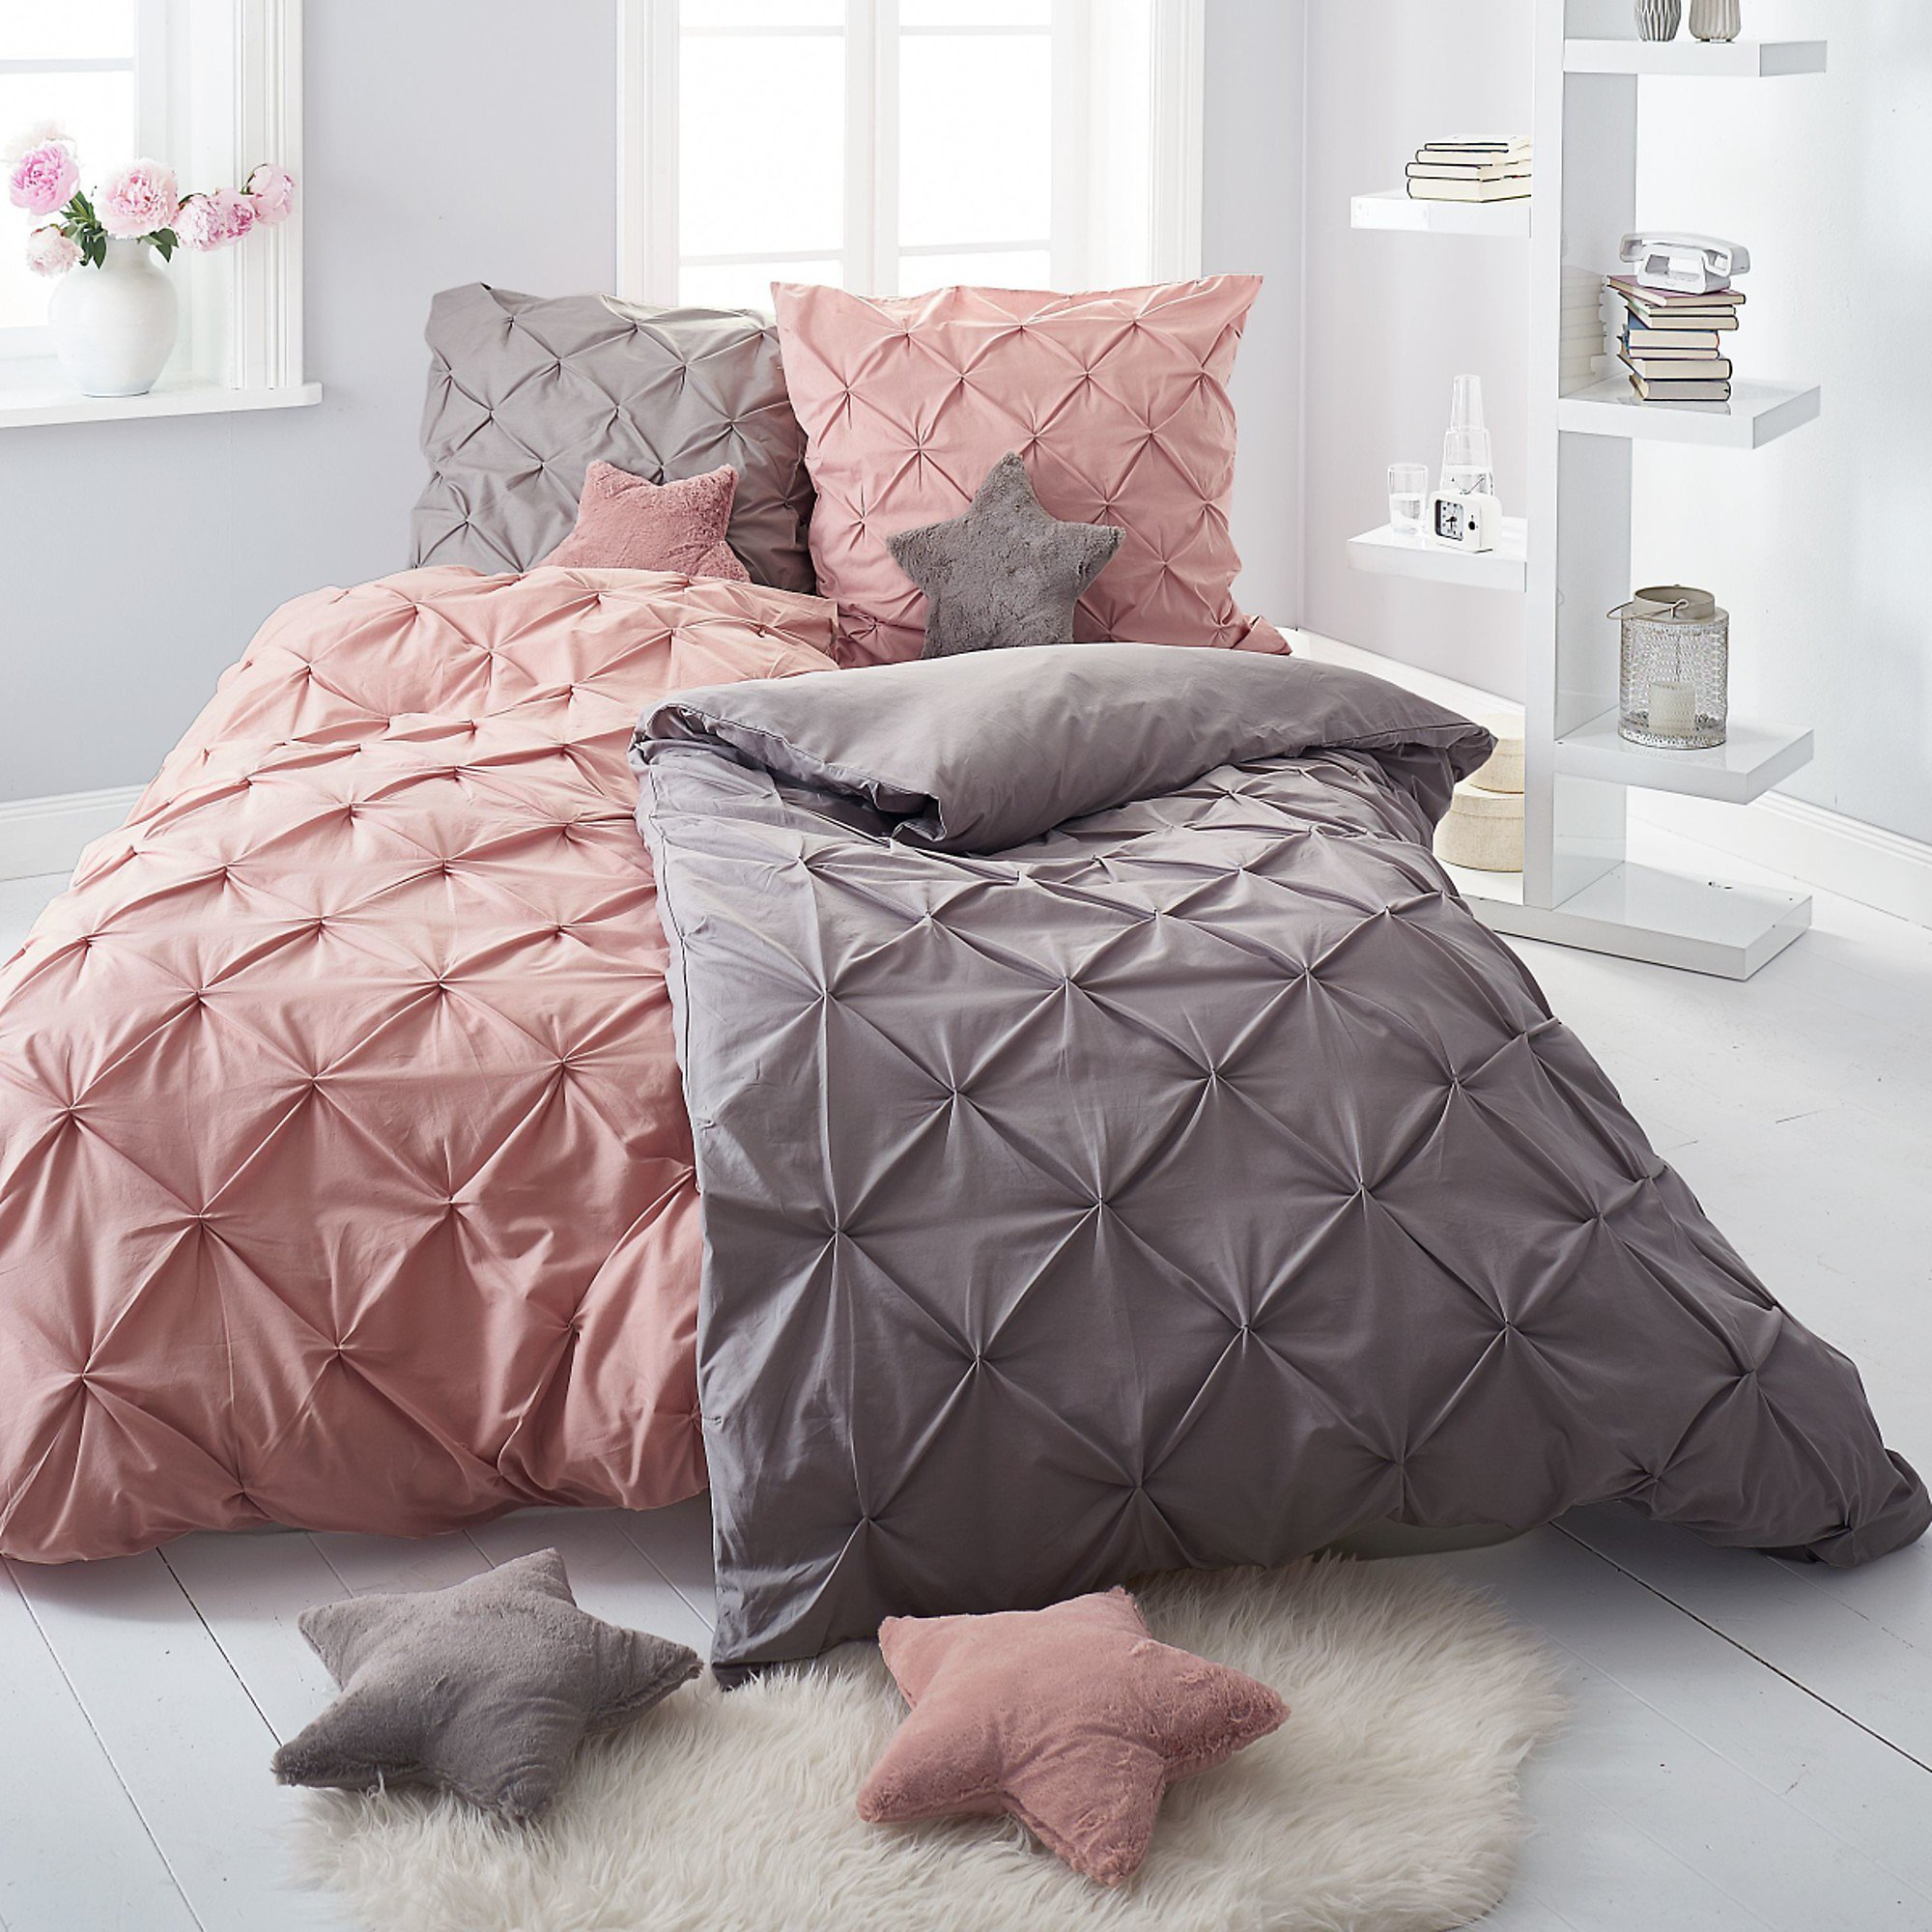 bettw sche finja grau 135 x 200 cm bestellen. Black Bedroom Furniture Sets. Home Design Ideas